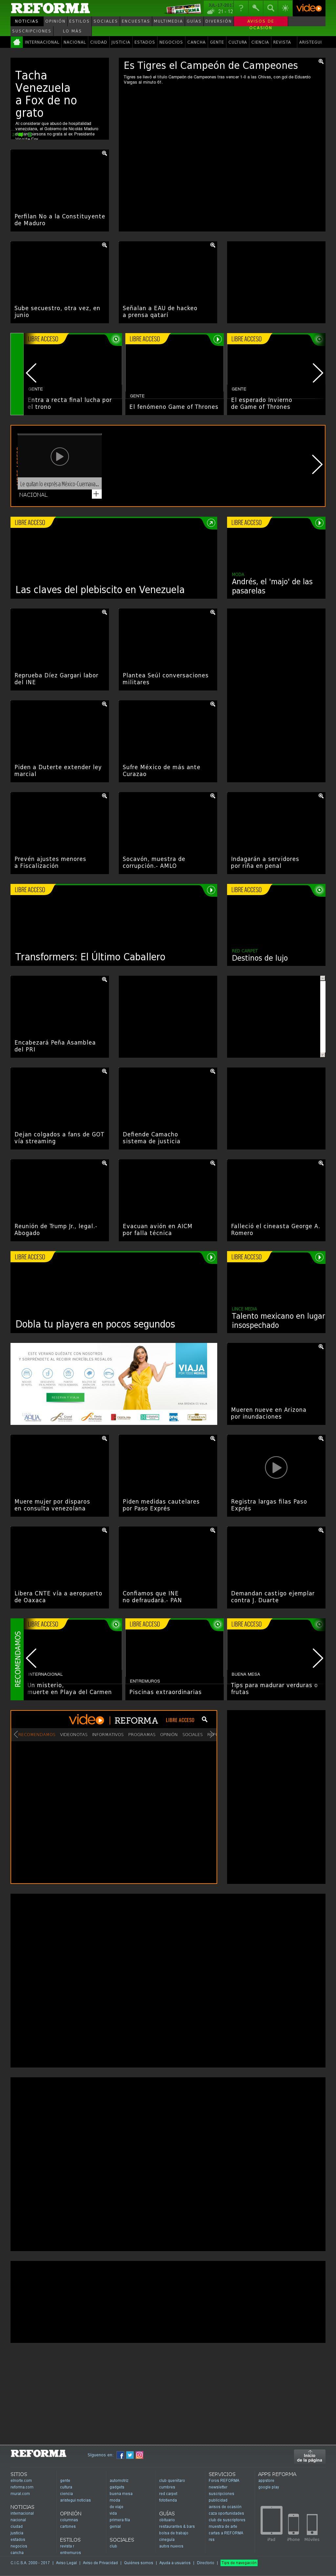 Reforma.com at Monday July 17, 2017, 7:26 a.m. UTC